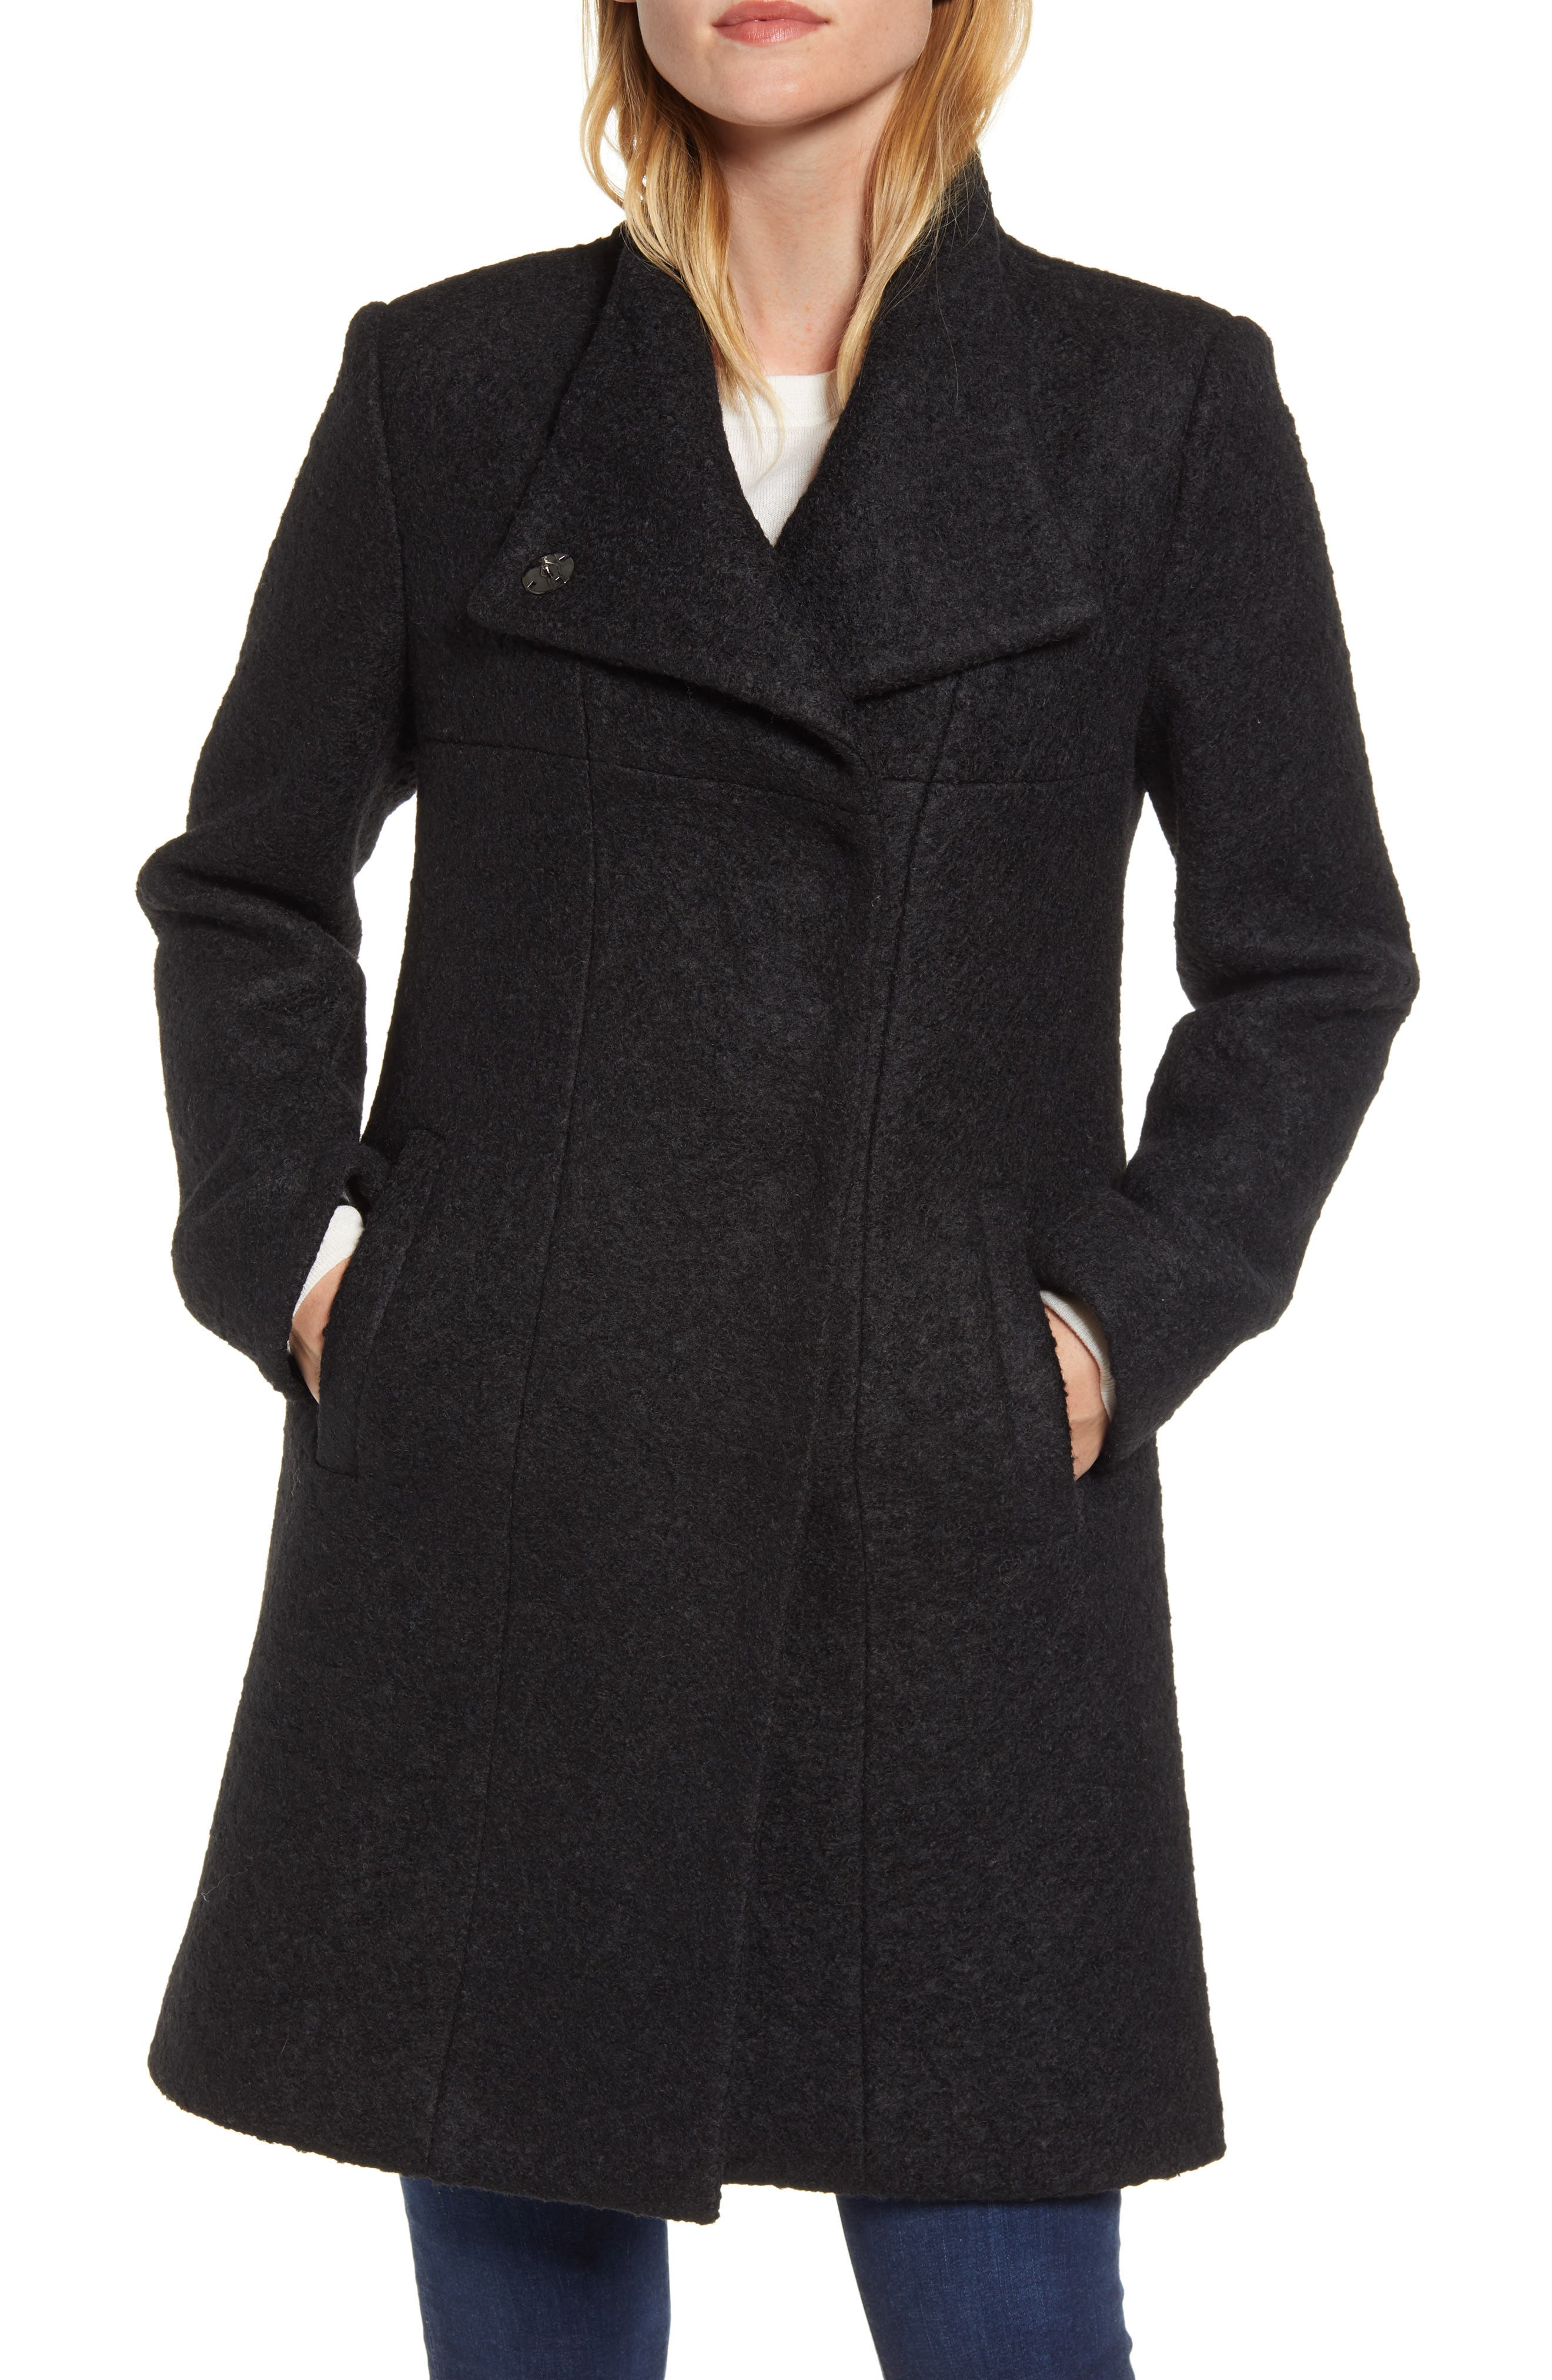 Maxi Coat Wool Coat Warm Winter Coat Long Black Coat Black Coat Ladies Winter Coat Long Coat XL Overcoat Pea Coat Winter Coat Women